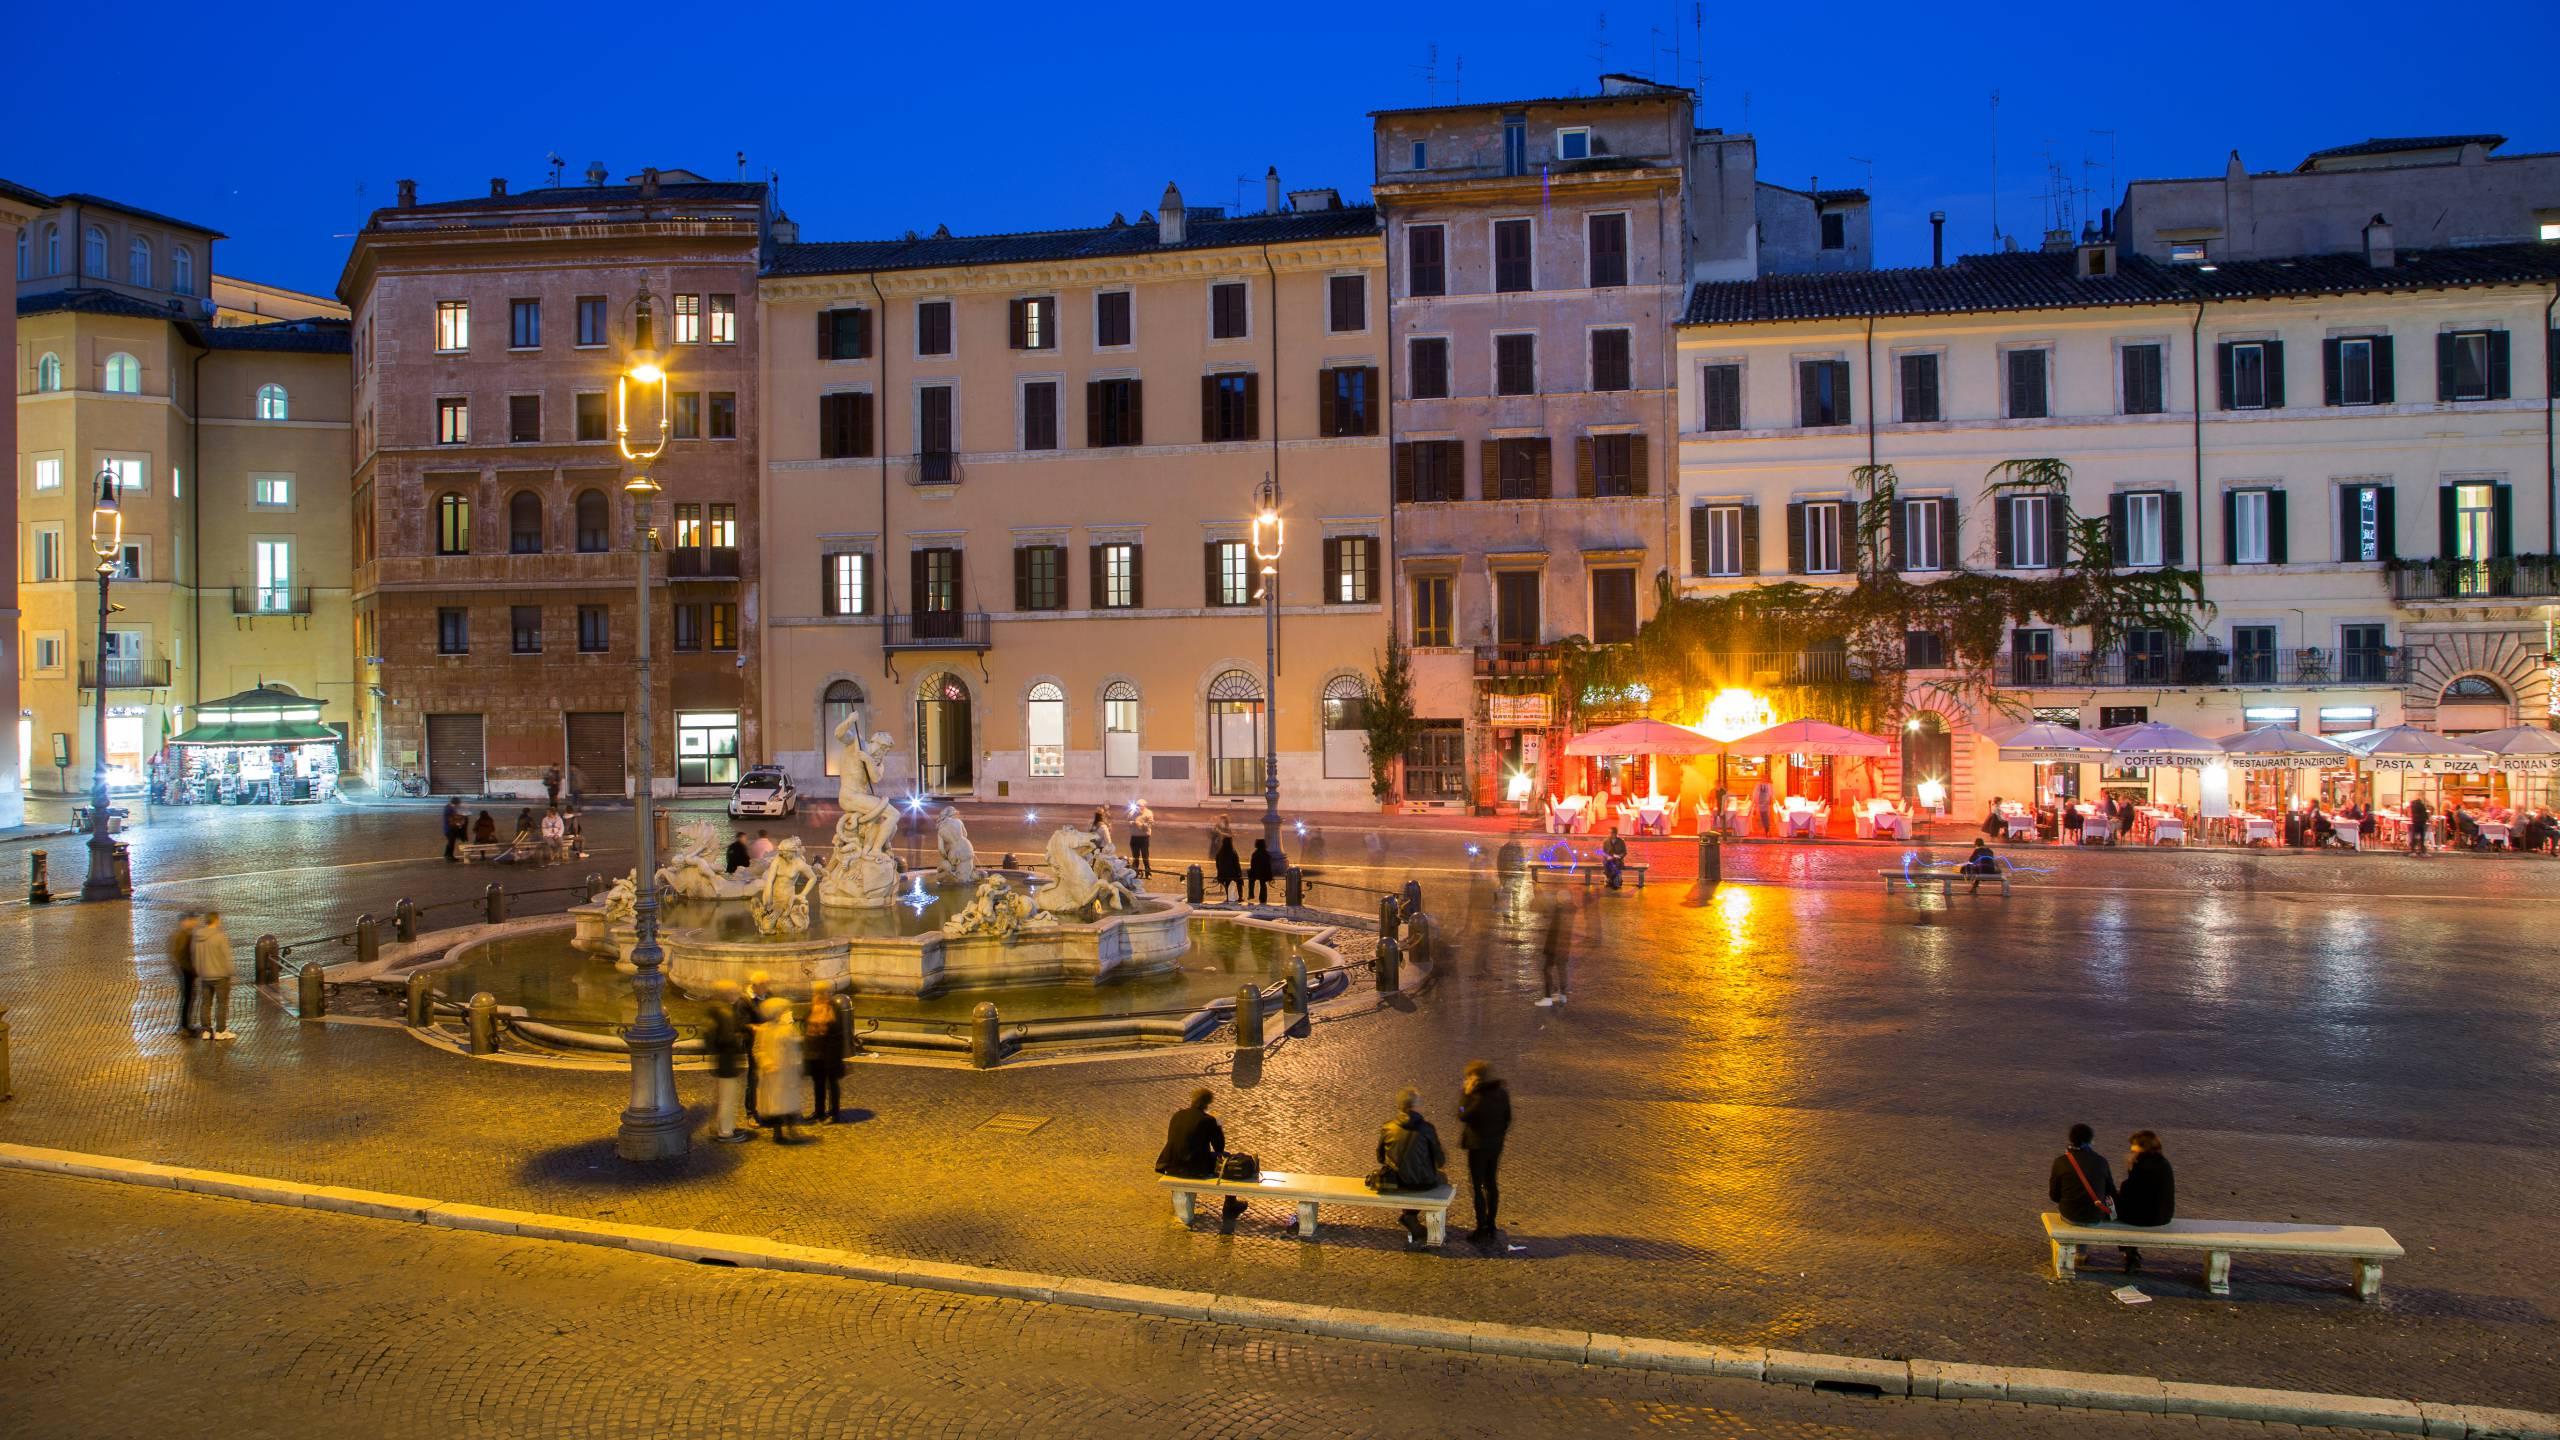 palazzo-de-cupis-rome-navona-square30